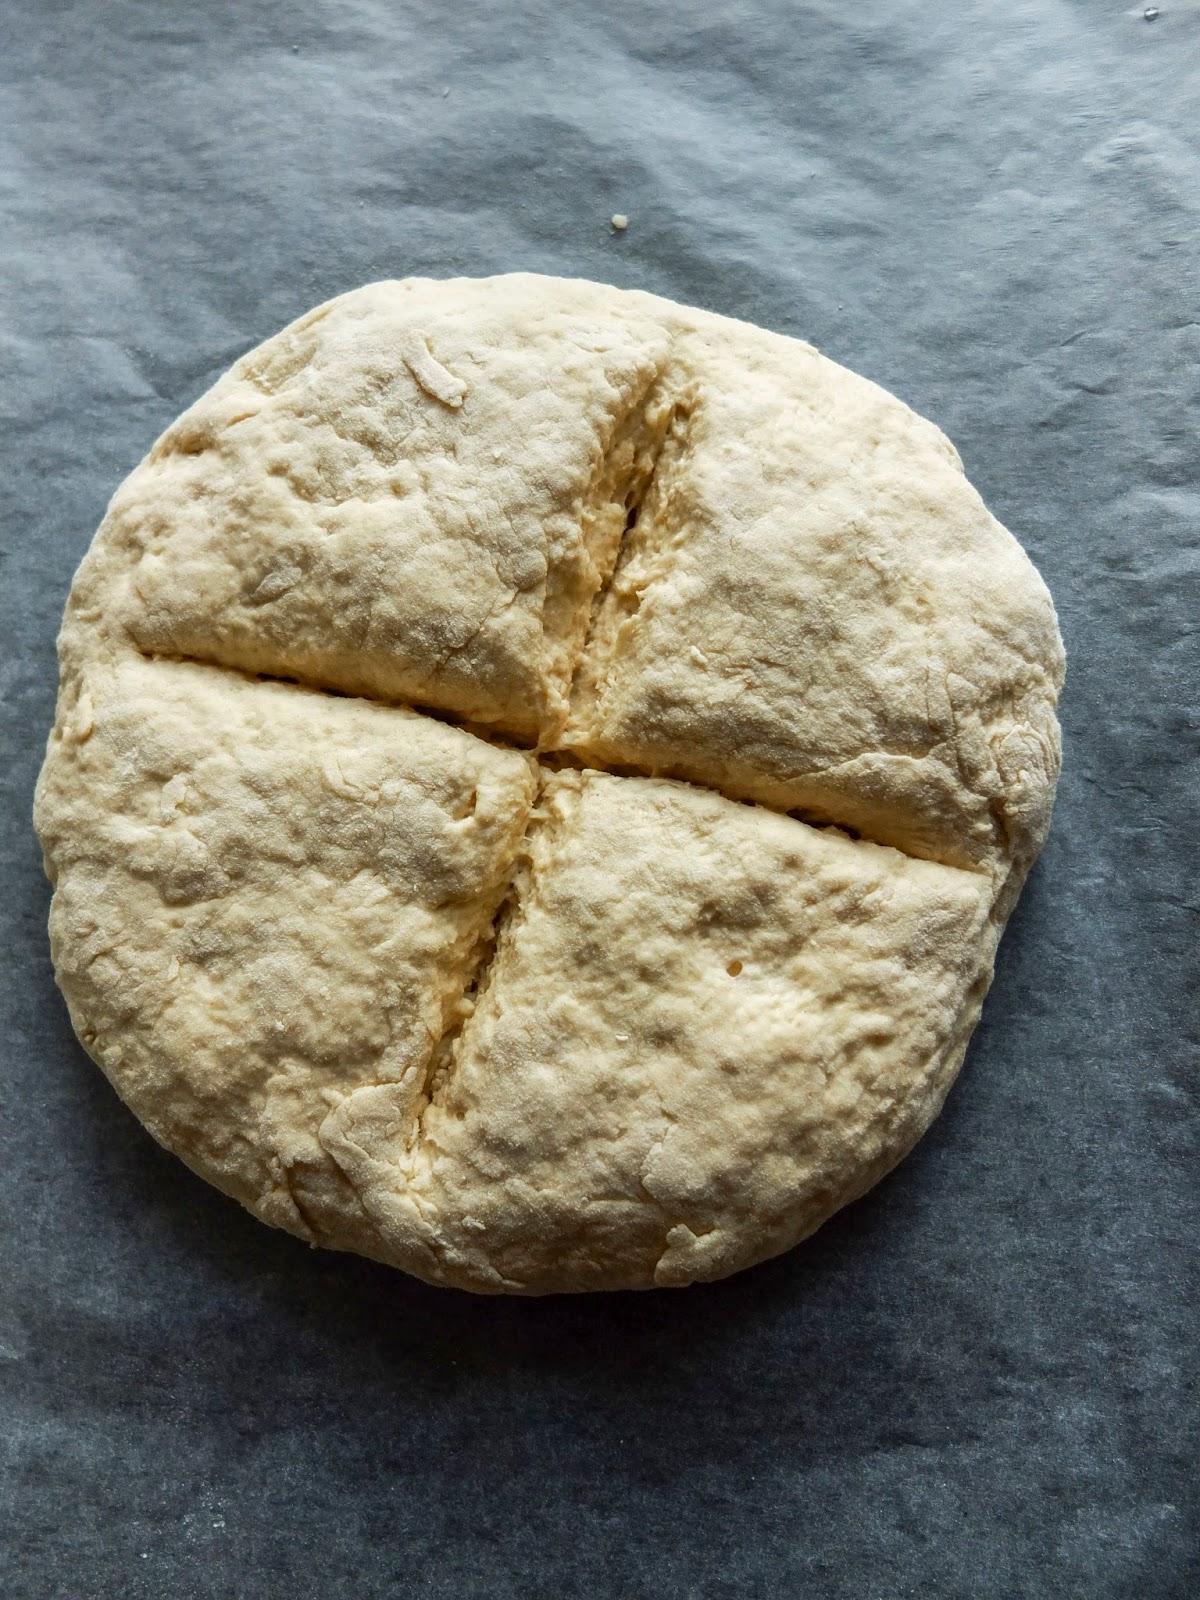 Irish Soda Bread before baking, cross shape cut into the dough.